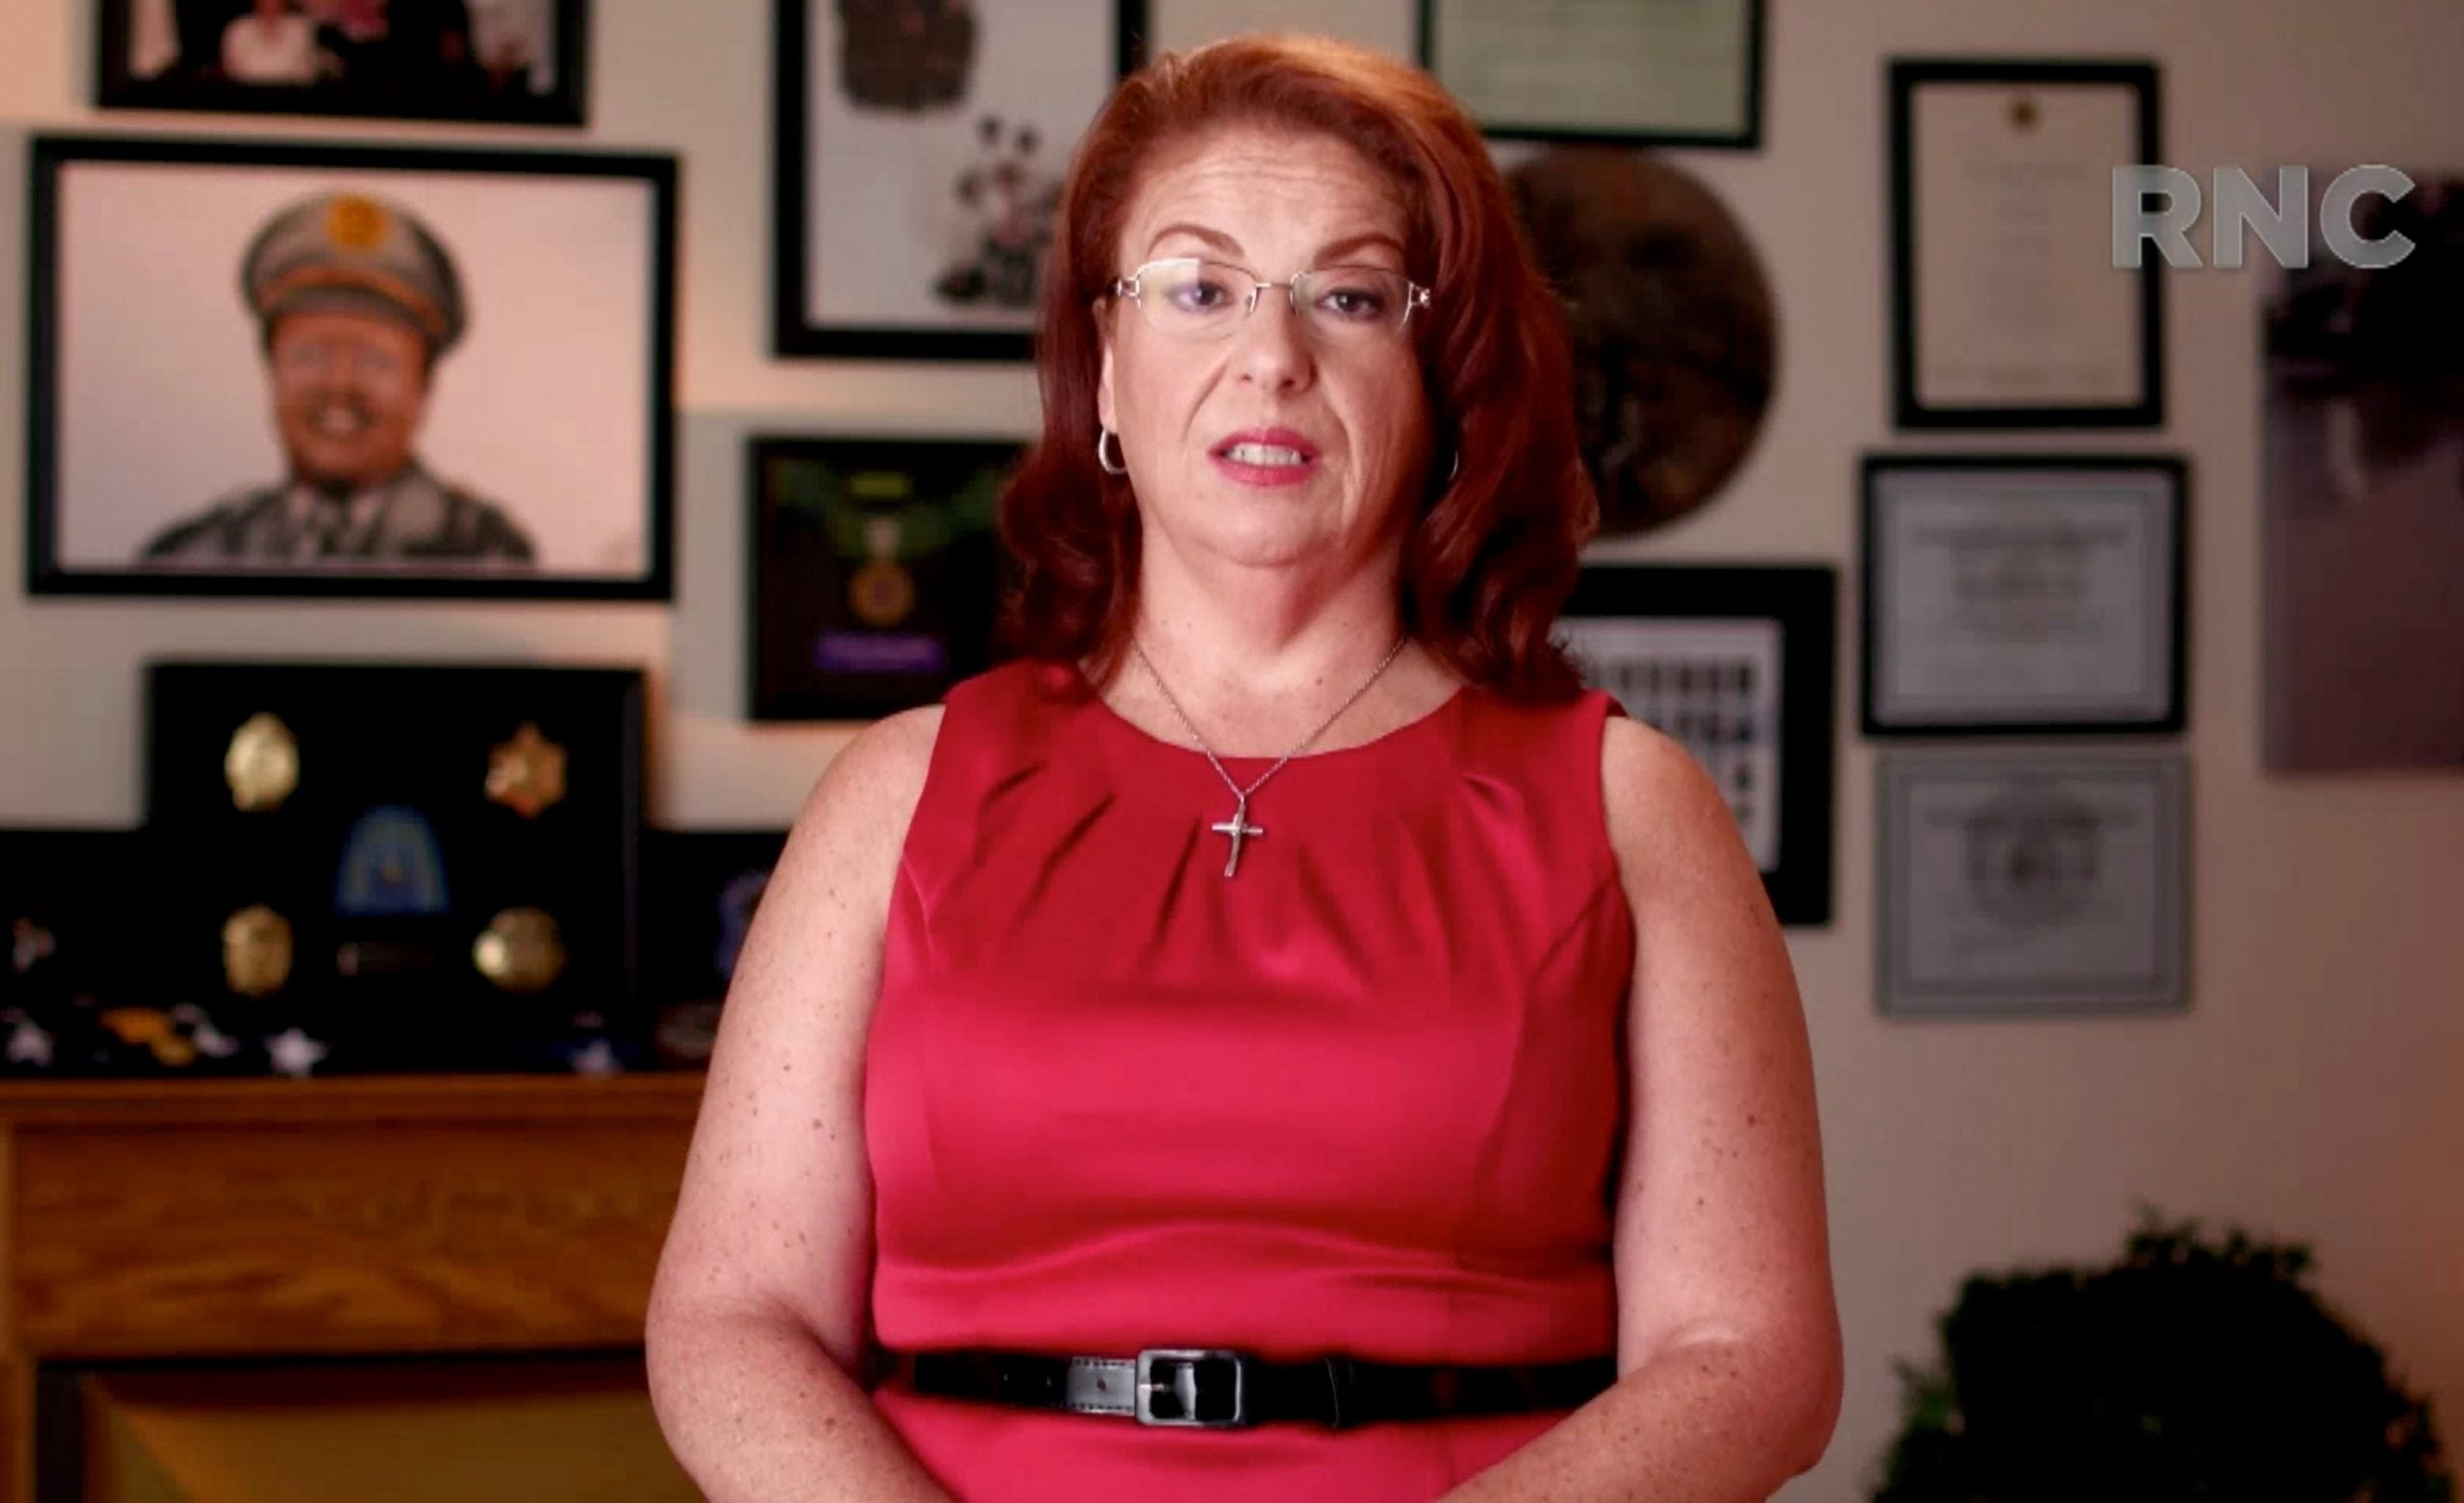 David Dorn's Daughters Rebuke Politicizing Of Father's Death At RNC